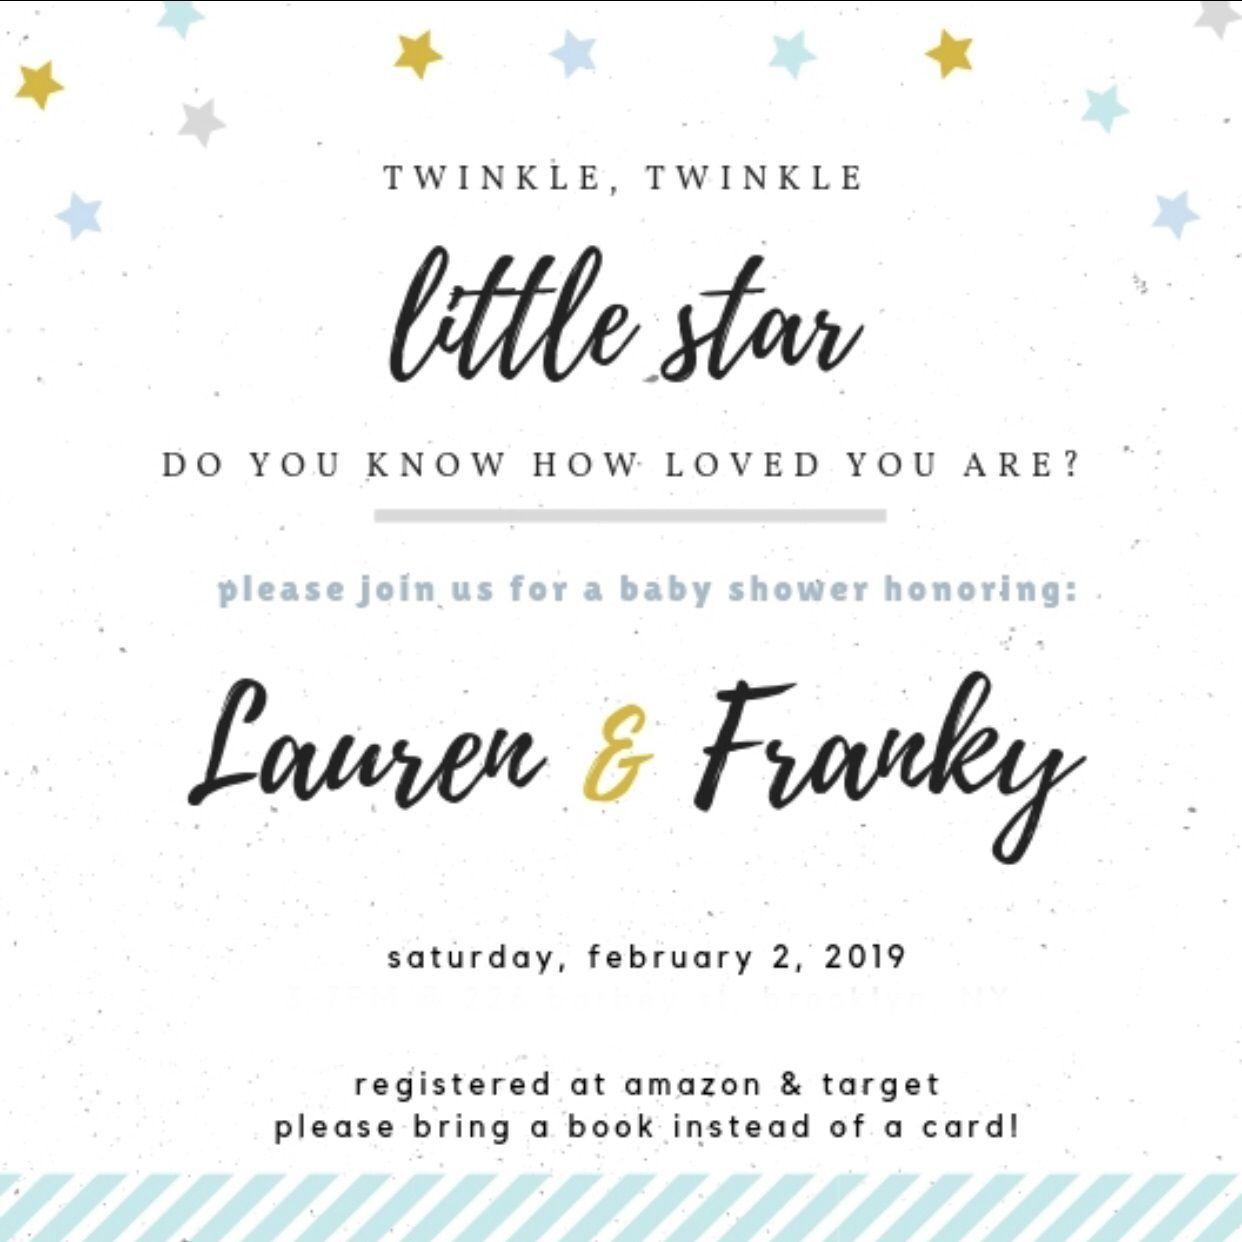 006 Wonderful Baby Shower Invitation Wording Example Highest Clarity  Examples Invite Coed Idea For BoyFull